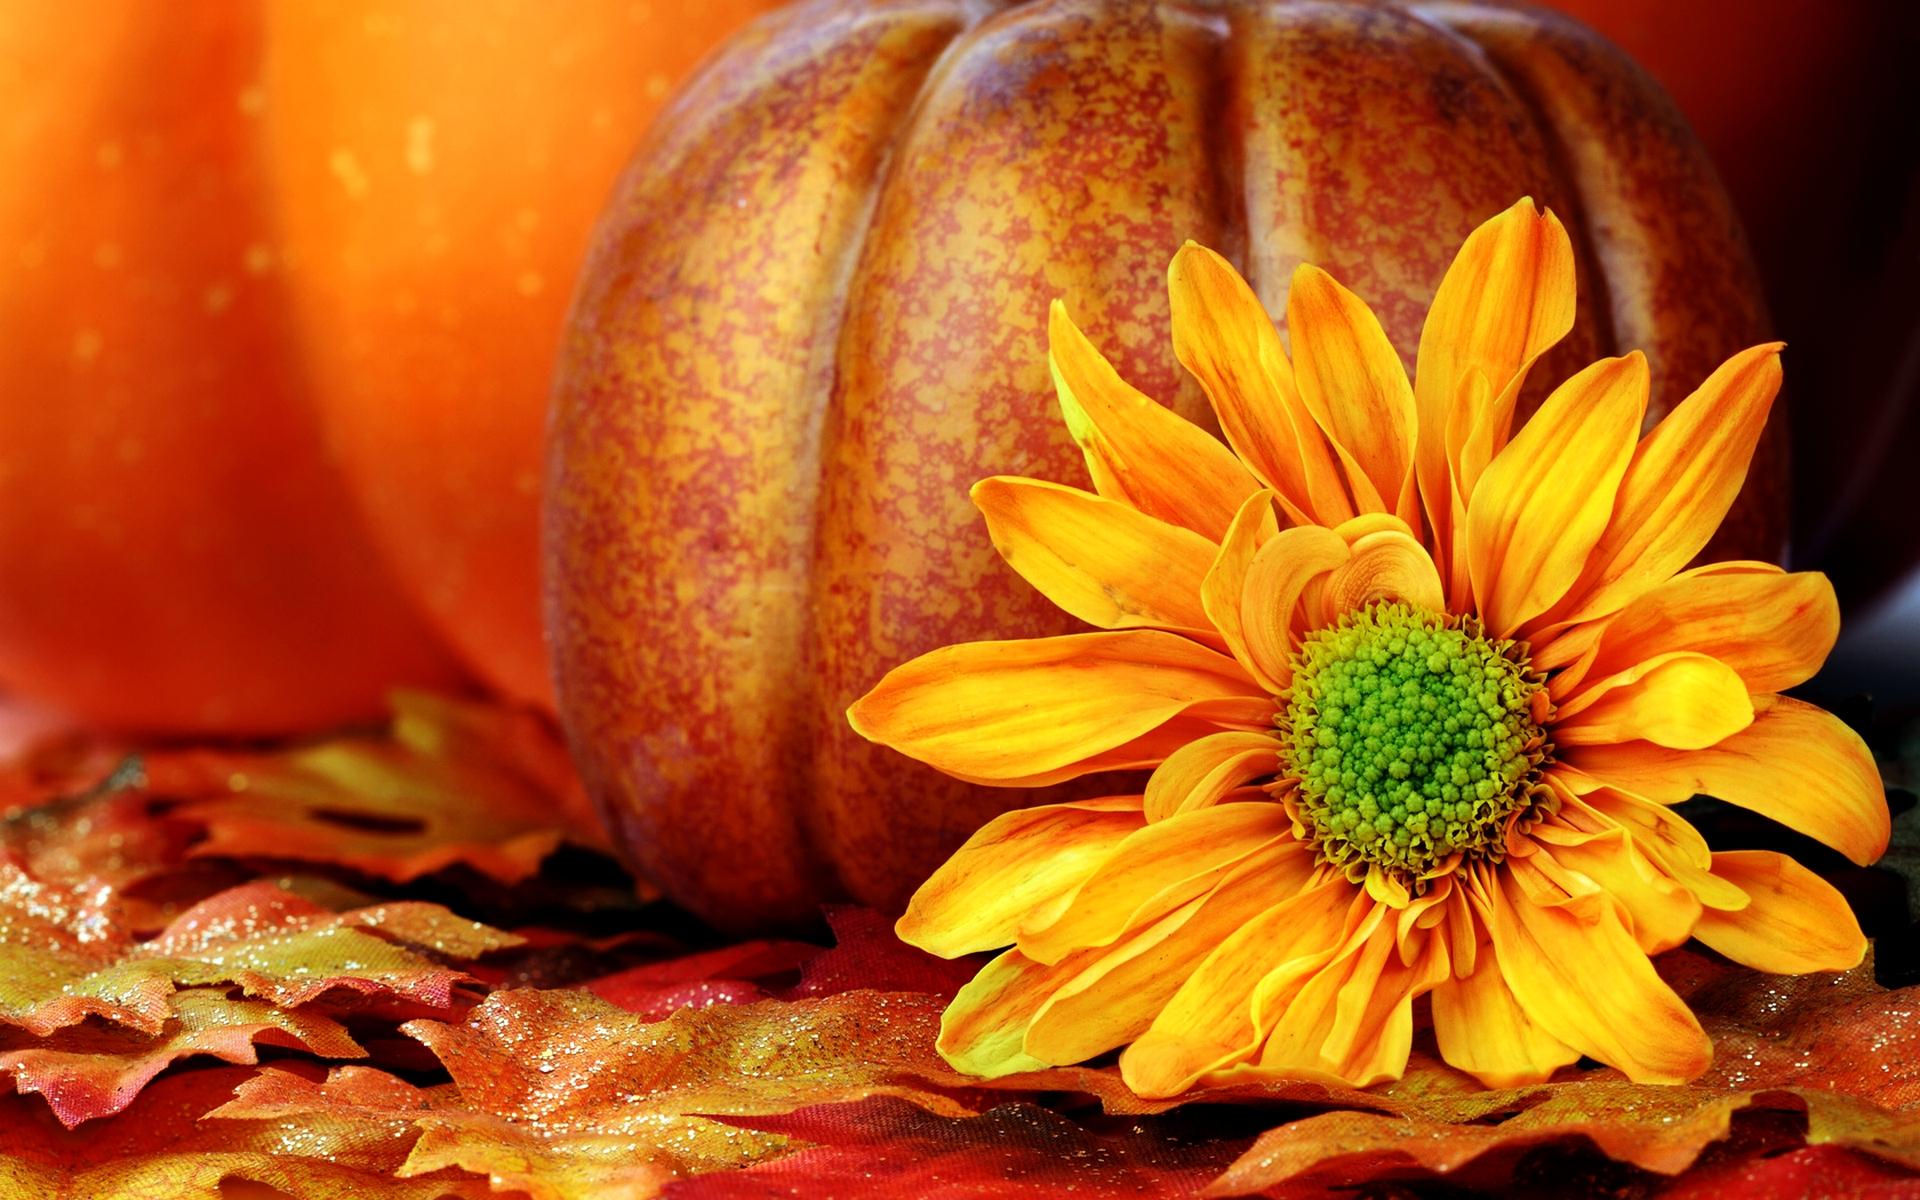 Free Fall Wallpapers with Pumpkins - WallpaperSafari